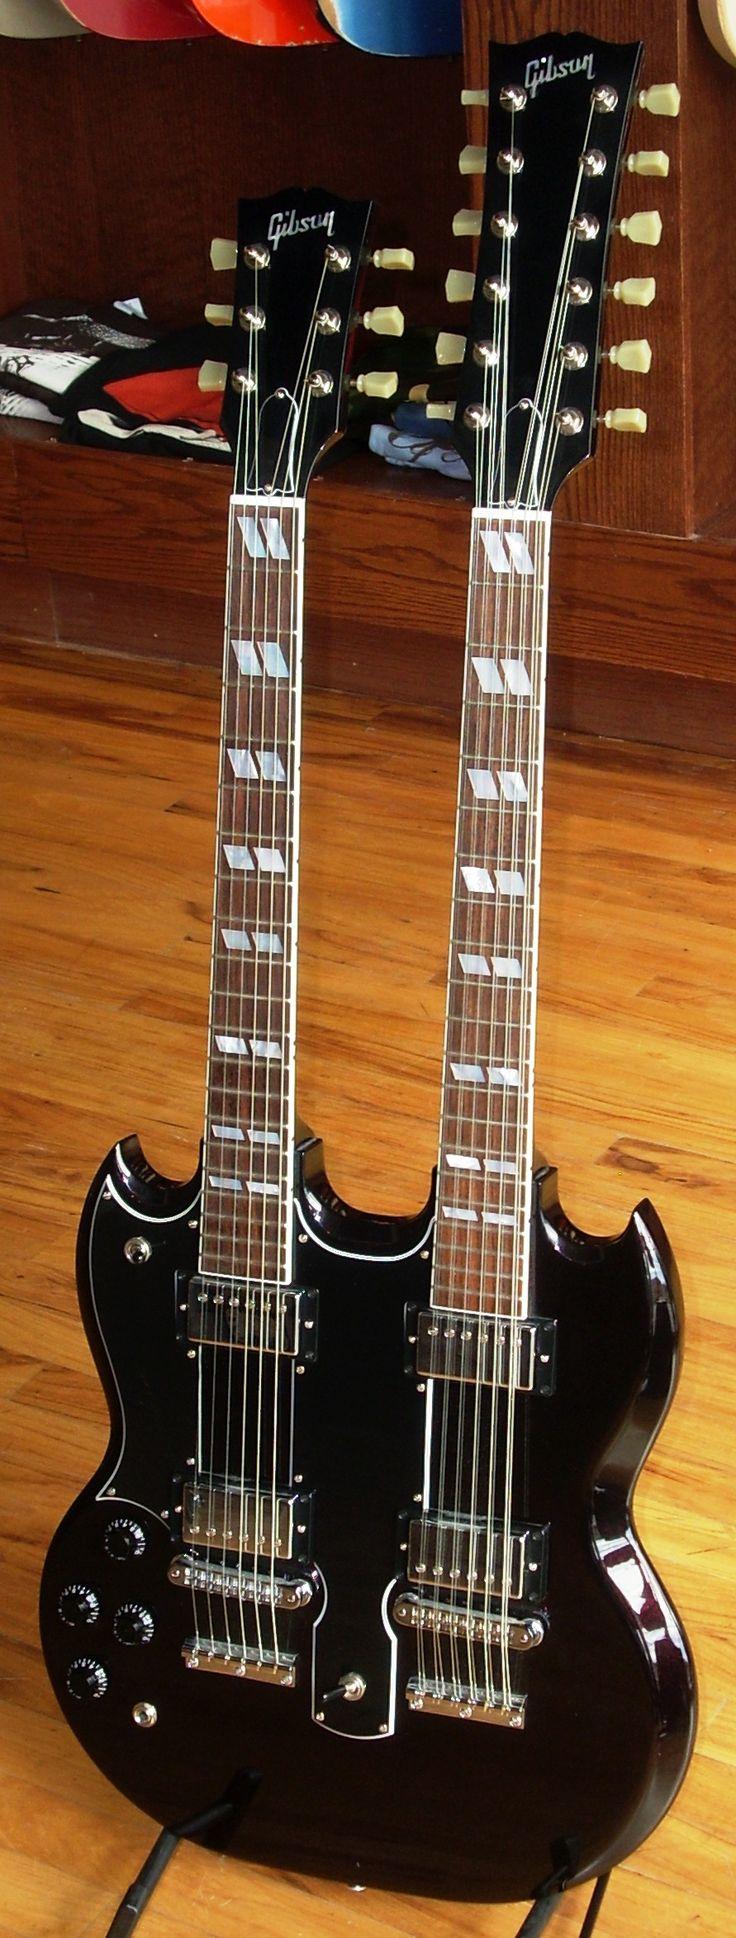 detail gibson les paul wiring diagram guitar legend sample